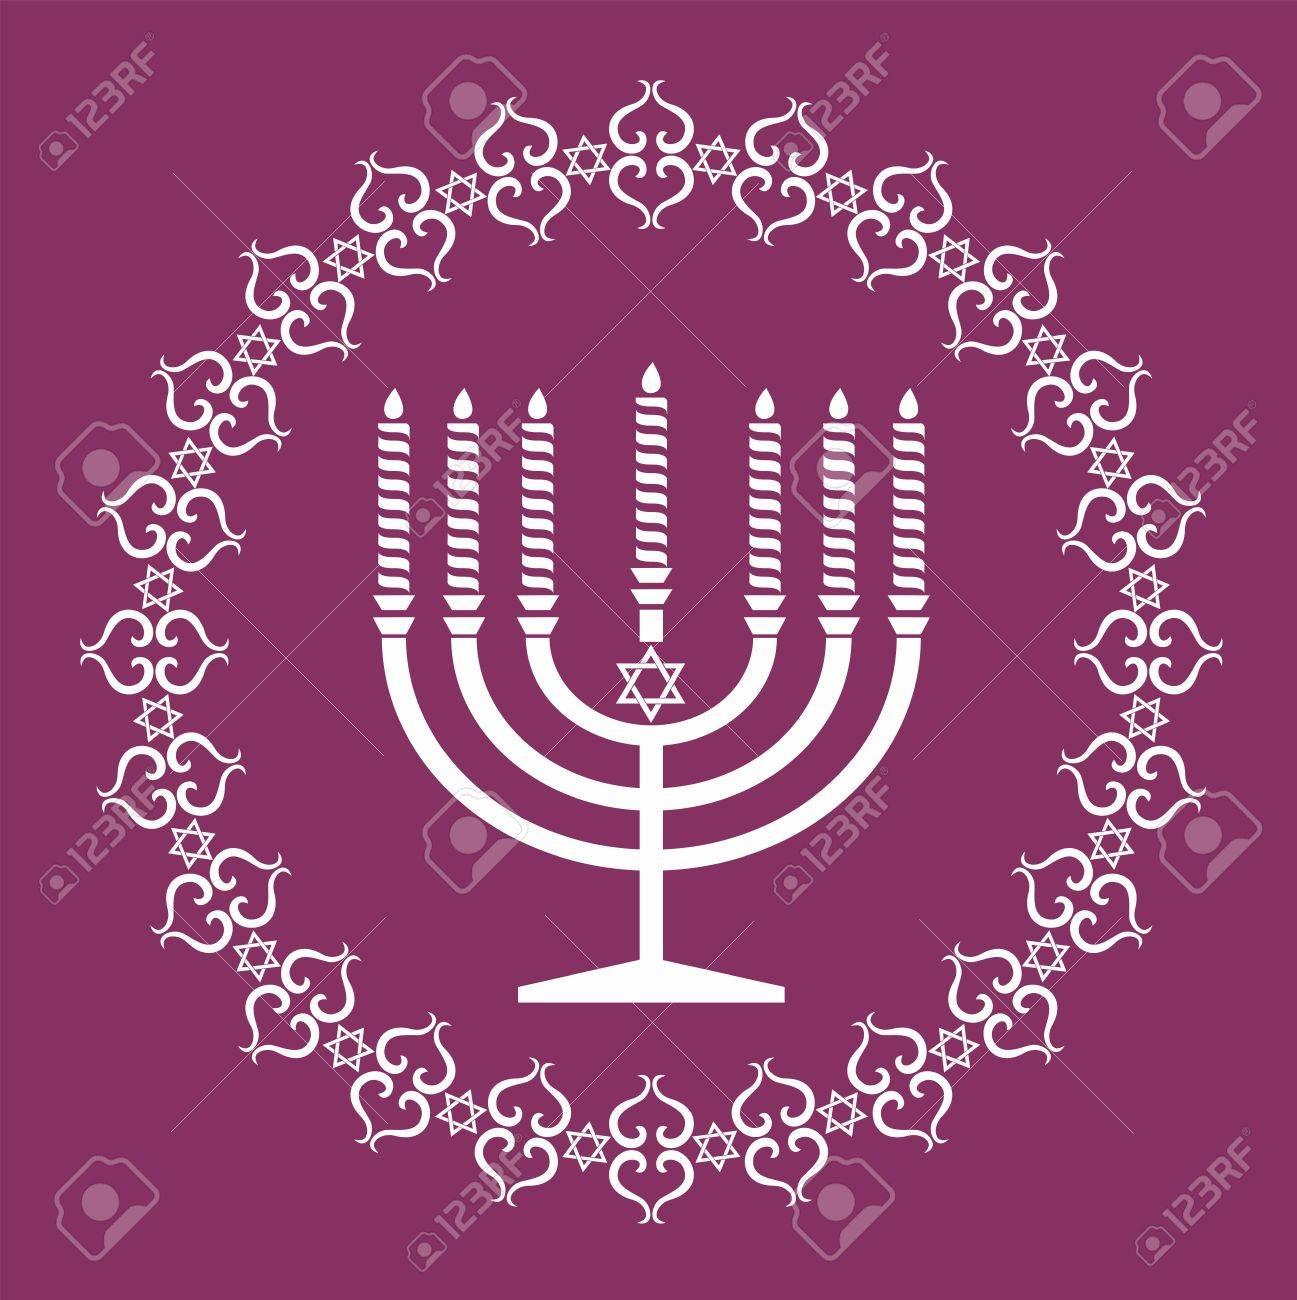 Jewish menorah holiday background Stock Vector - 15844977